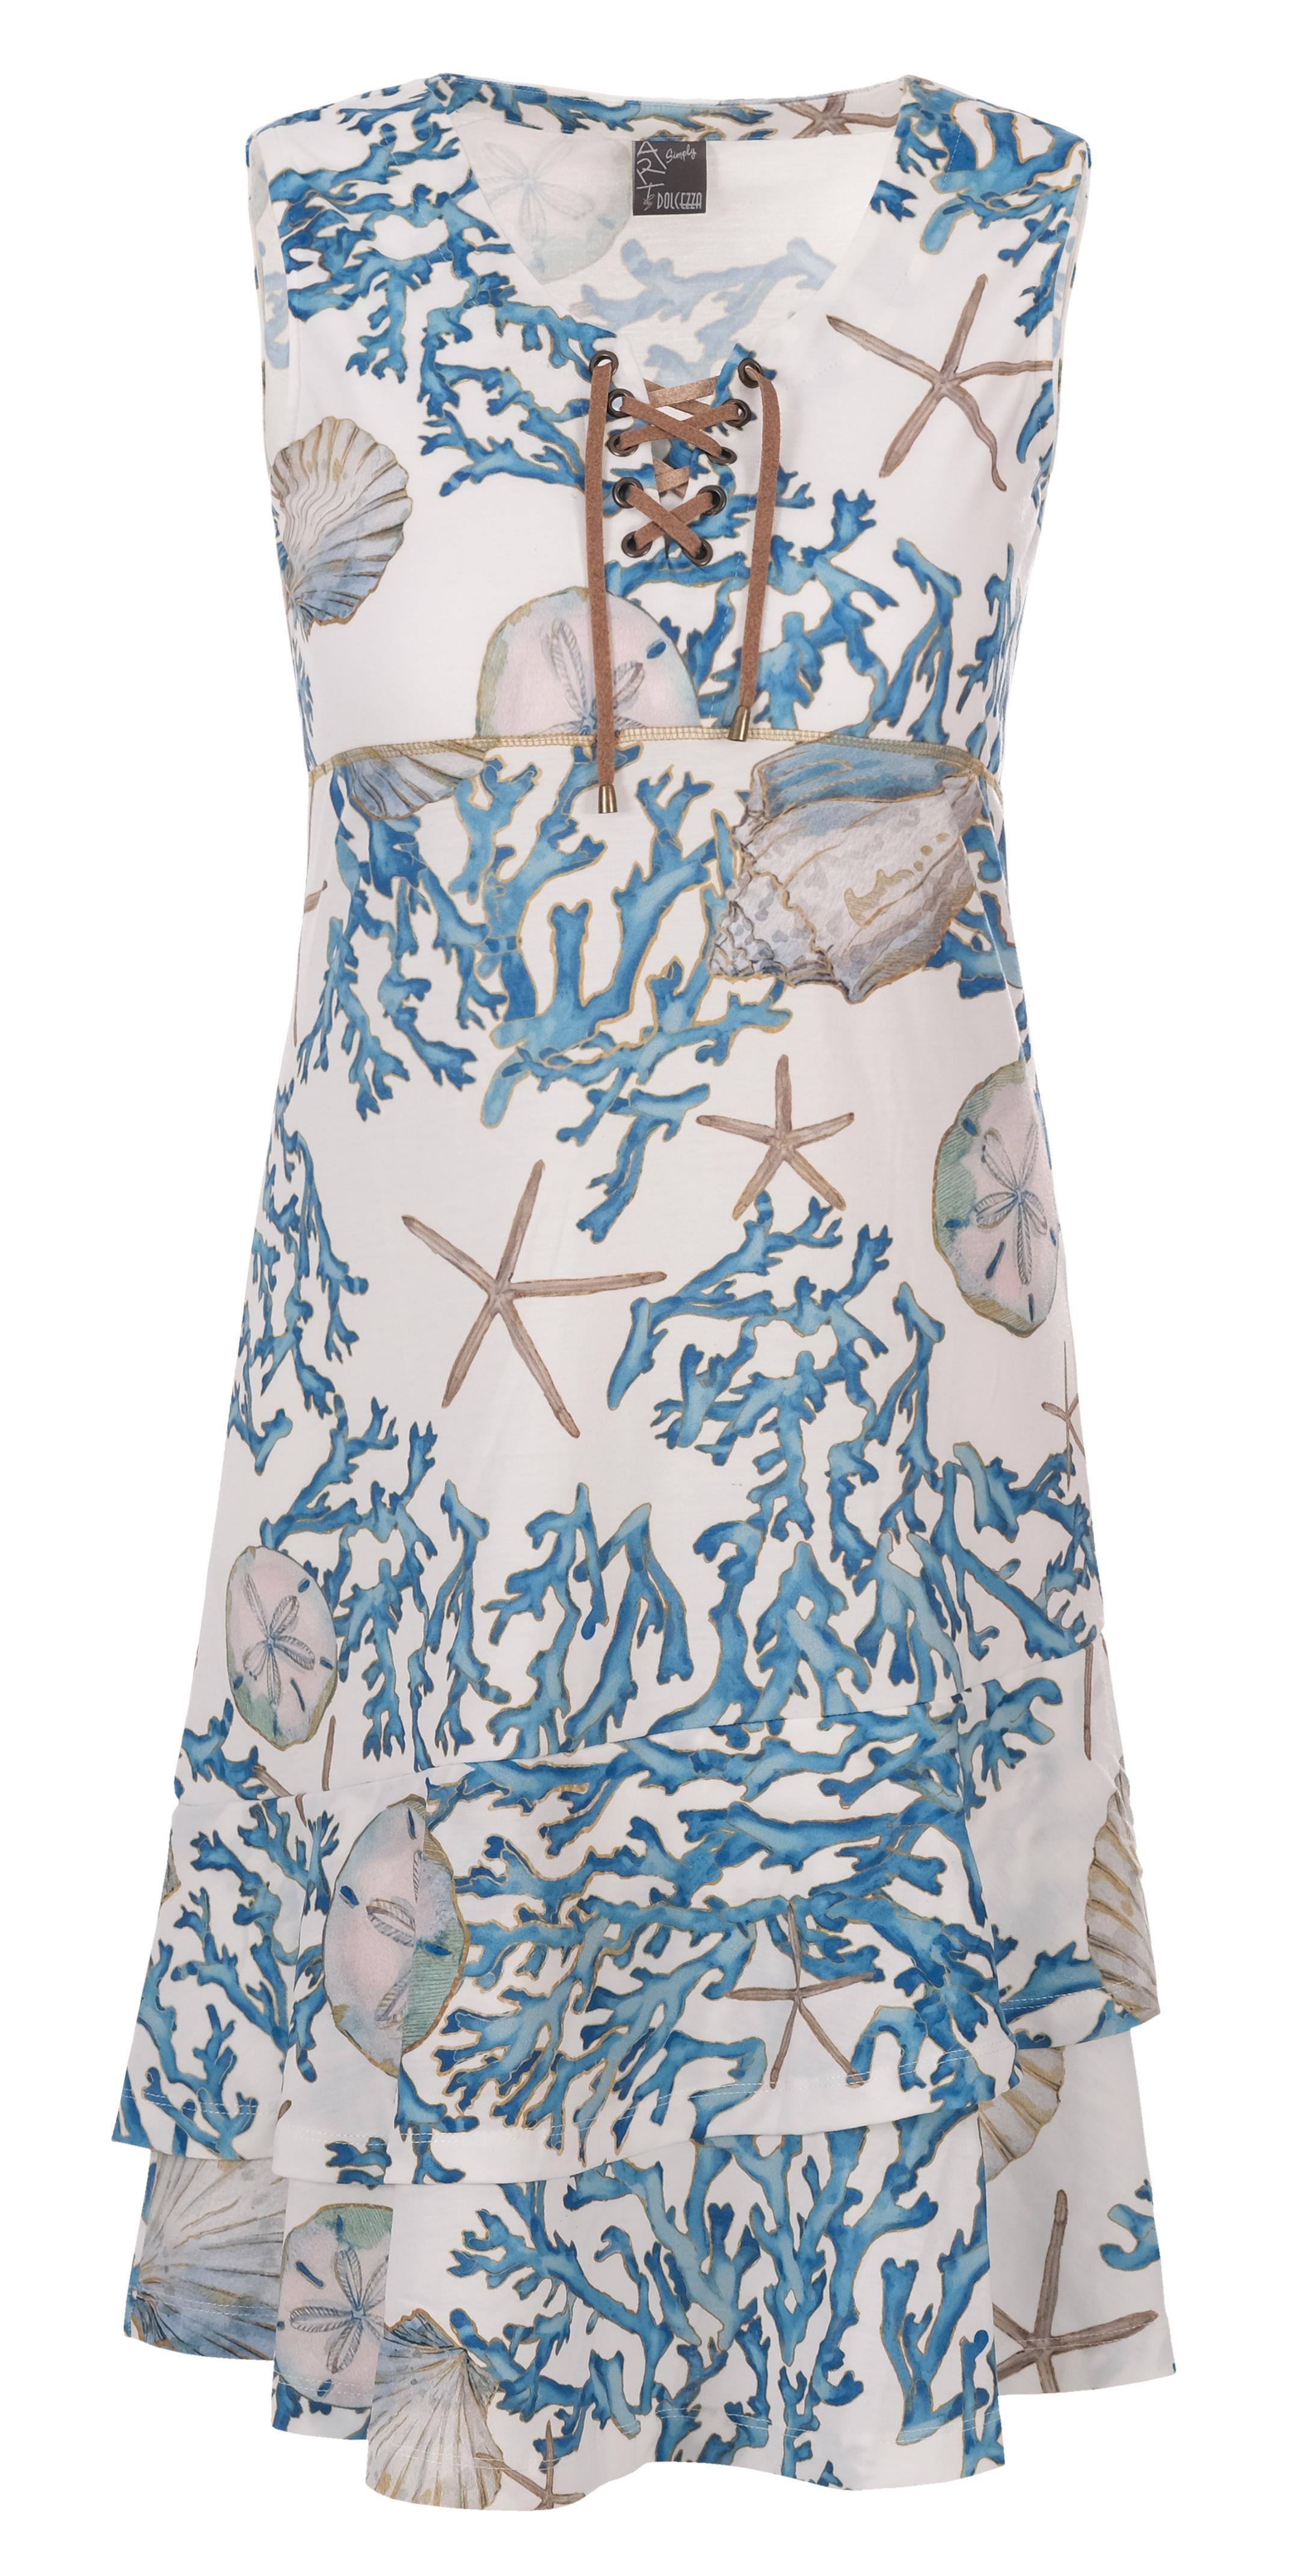 Simply Art Dolcezza: Playa Shells Abstract Art Double Ruffled Hem Dress (1 Left!) Dolcezza_SimplyArt_21756